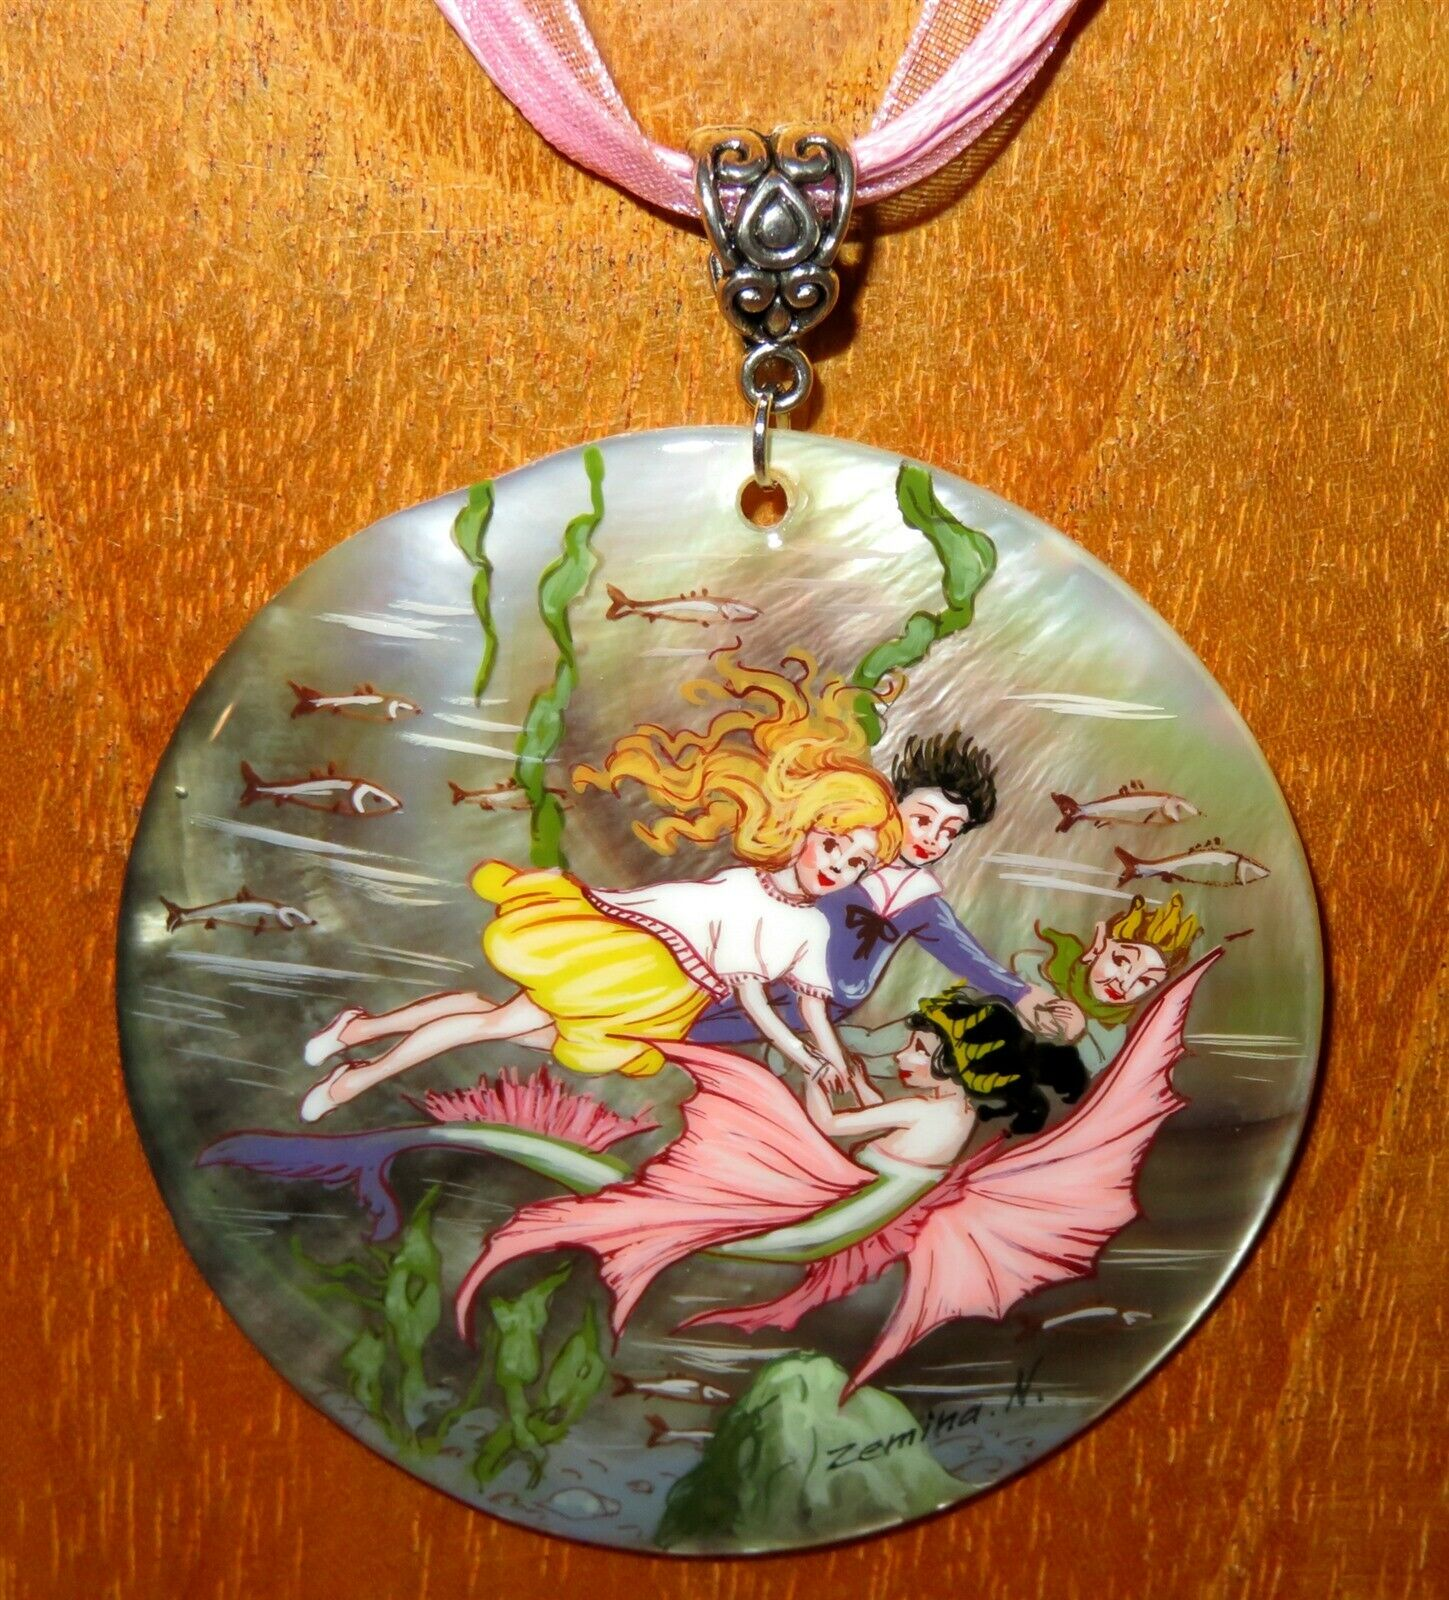 Fee & Mermaid Anhänger Florence Maria Anderson Feen Handbemalt Muschel Zemina